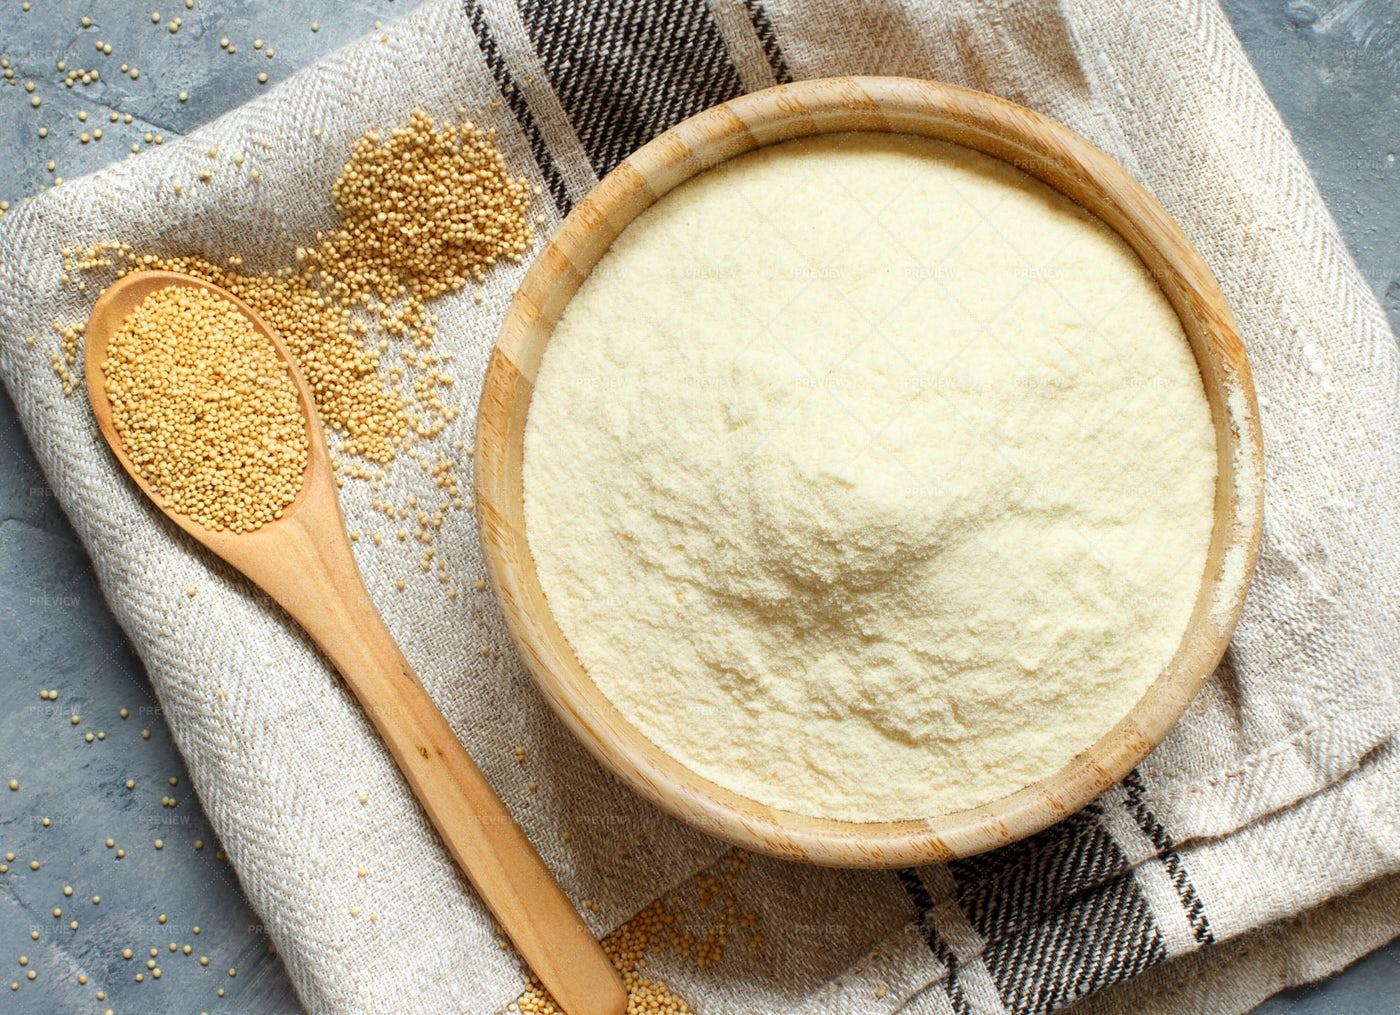 Raw Amaranth Flour And Seeds: Stock Photos